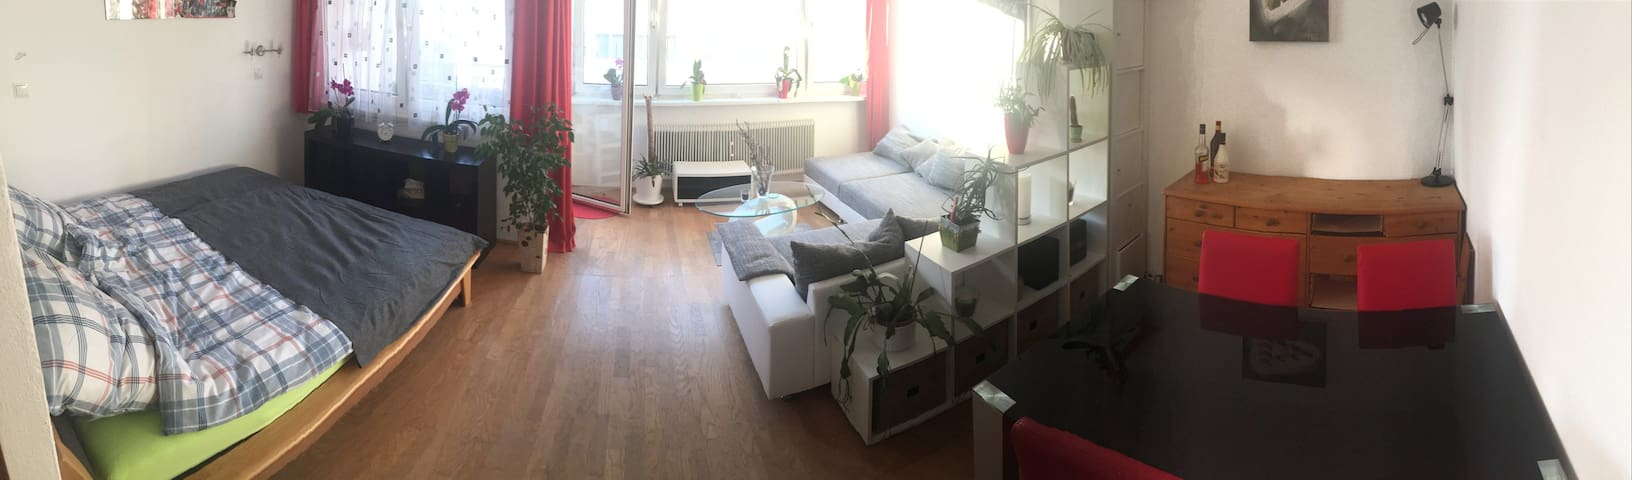 Wohnung Elizabeth - Salzburg